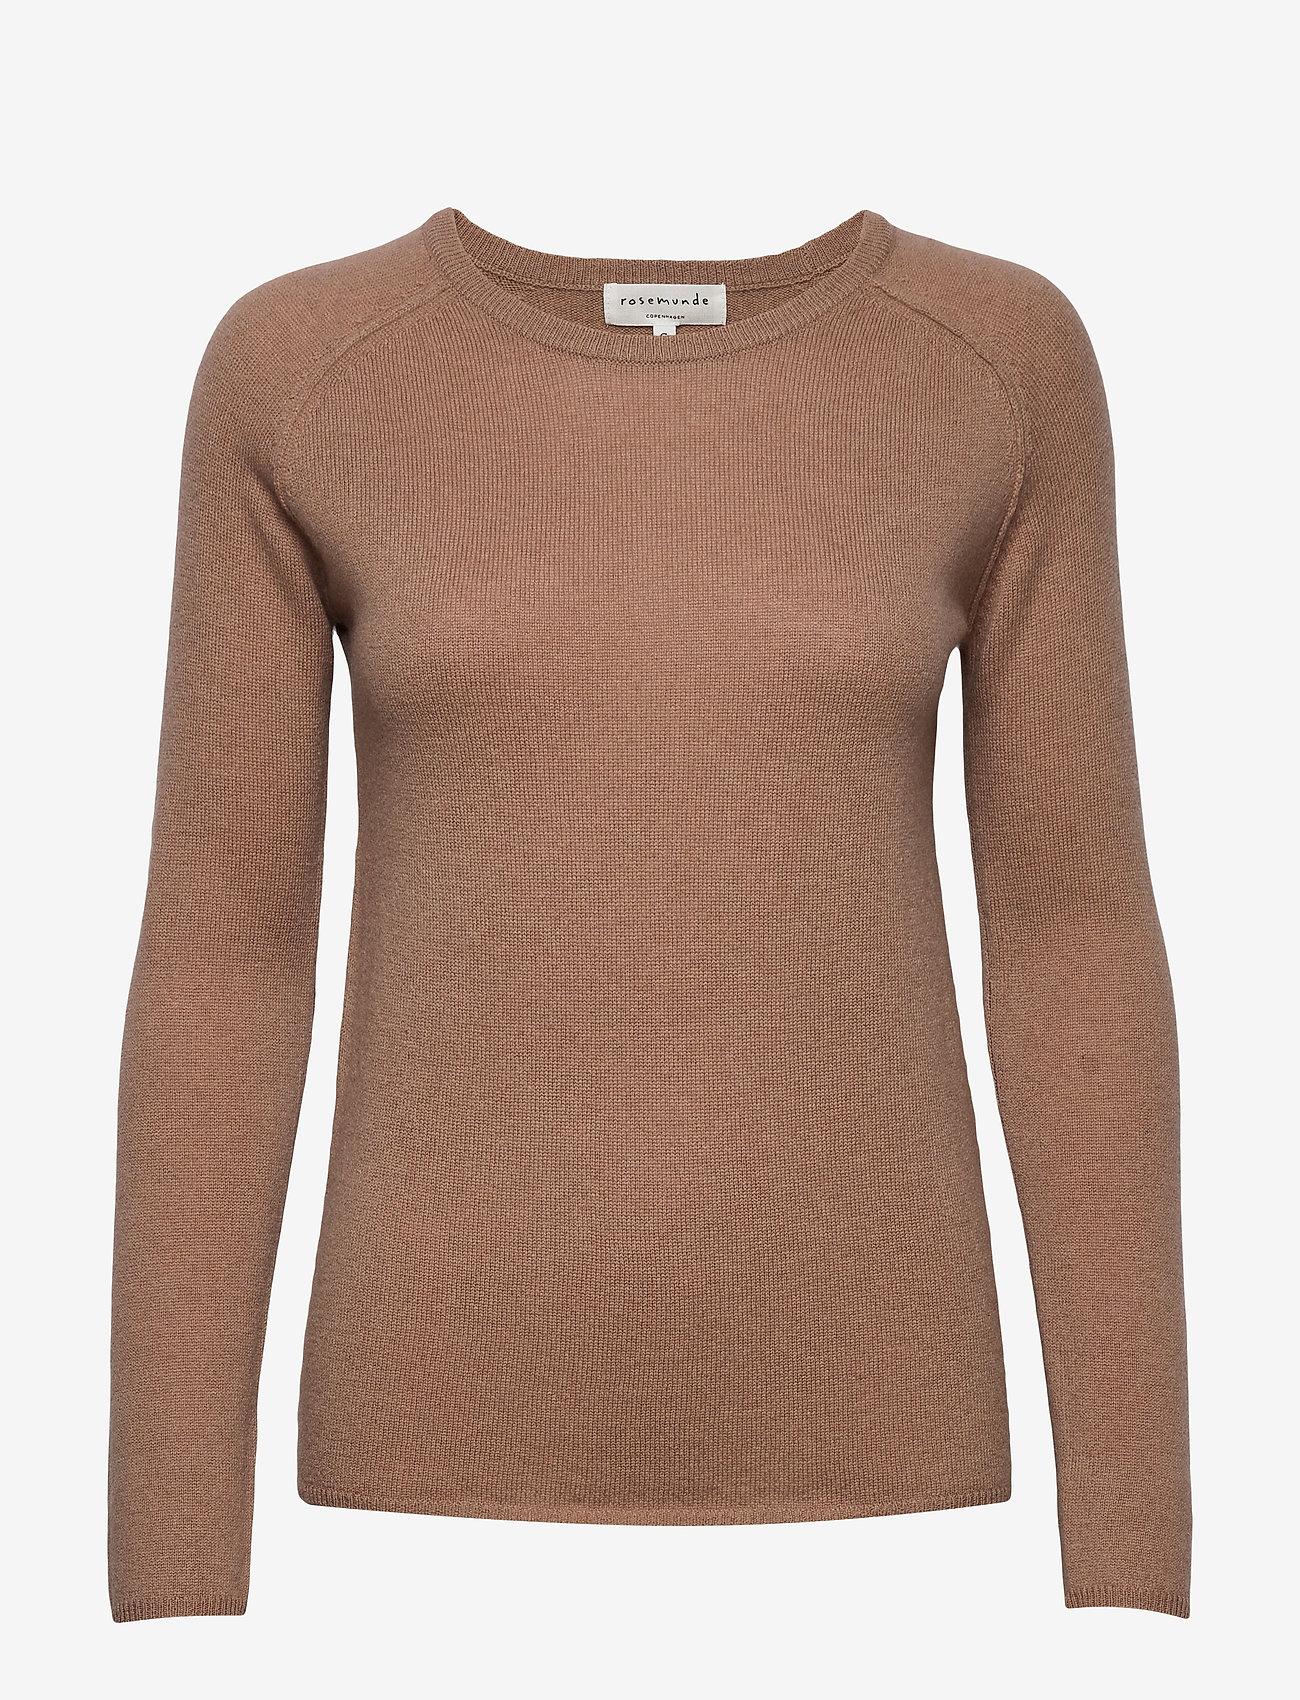 Rosemunde - Wool & cashmere pullover ls - kashmir - nougat brown - 0